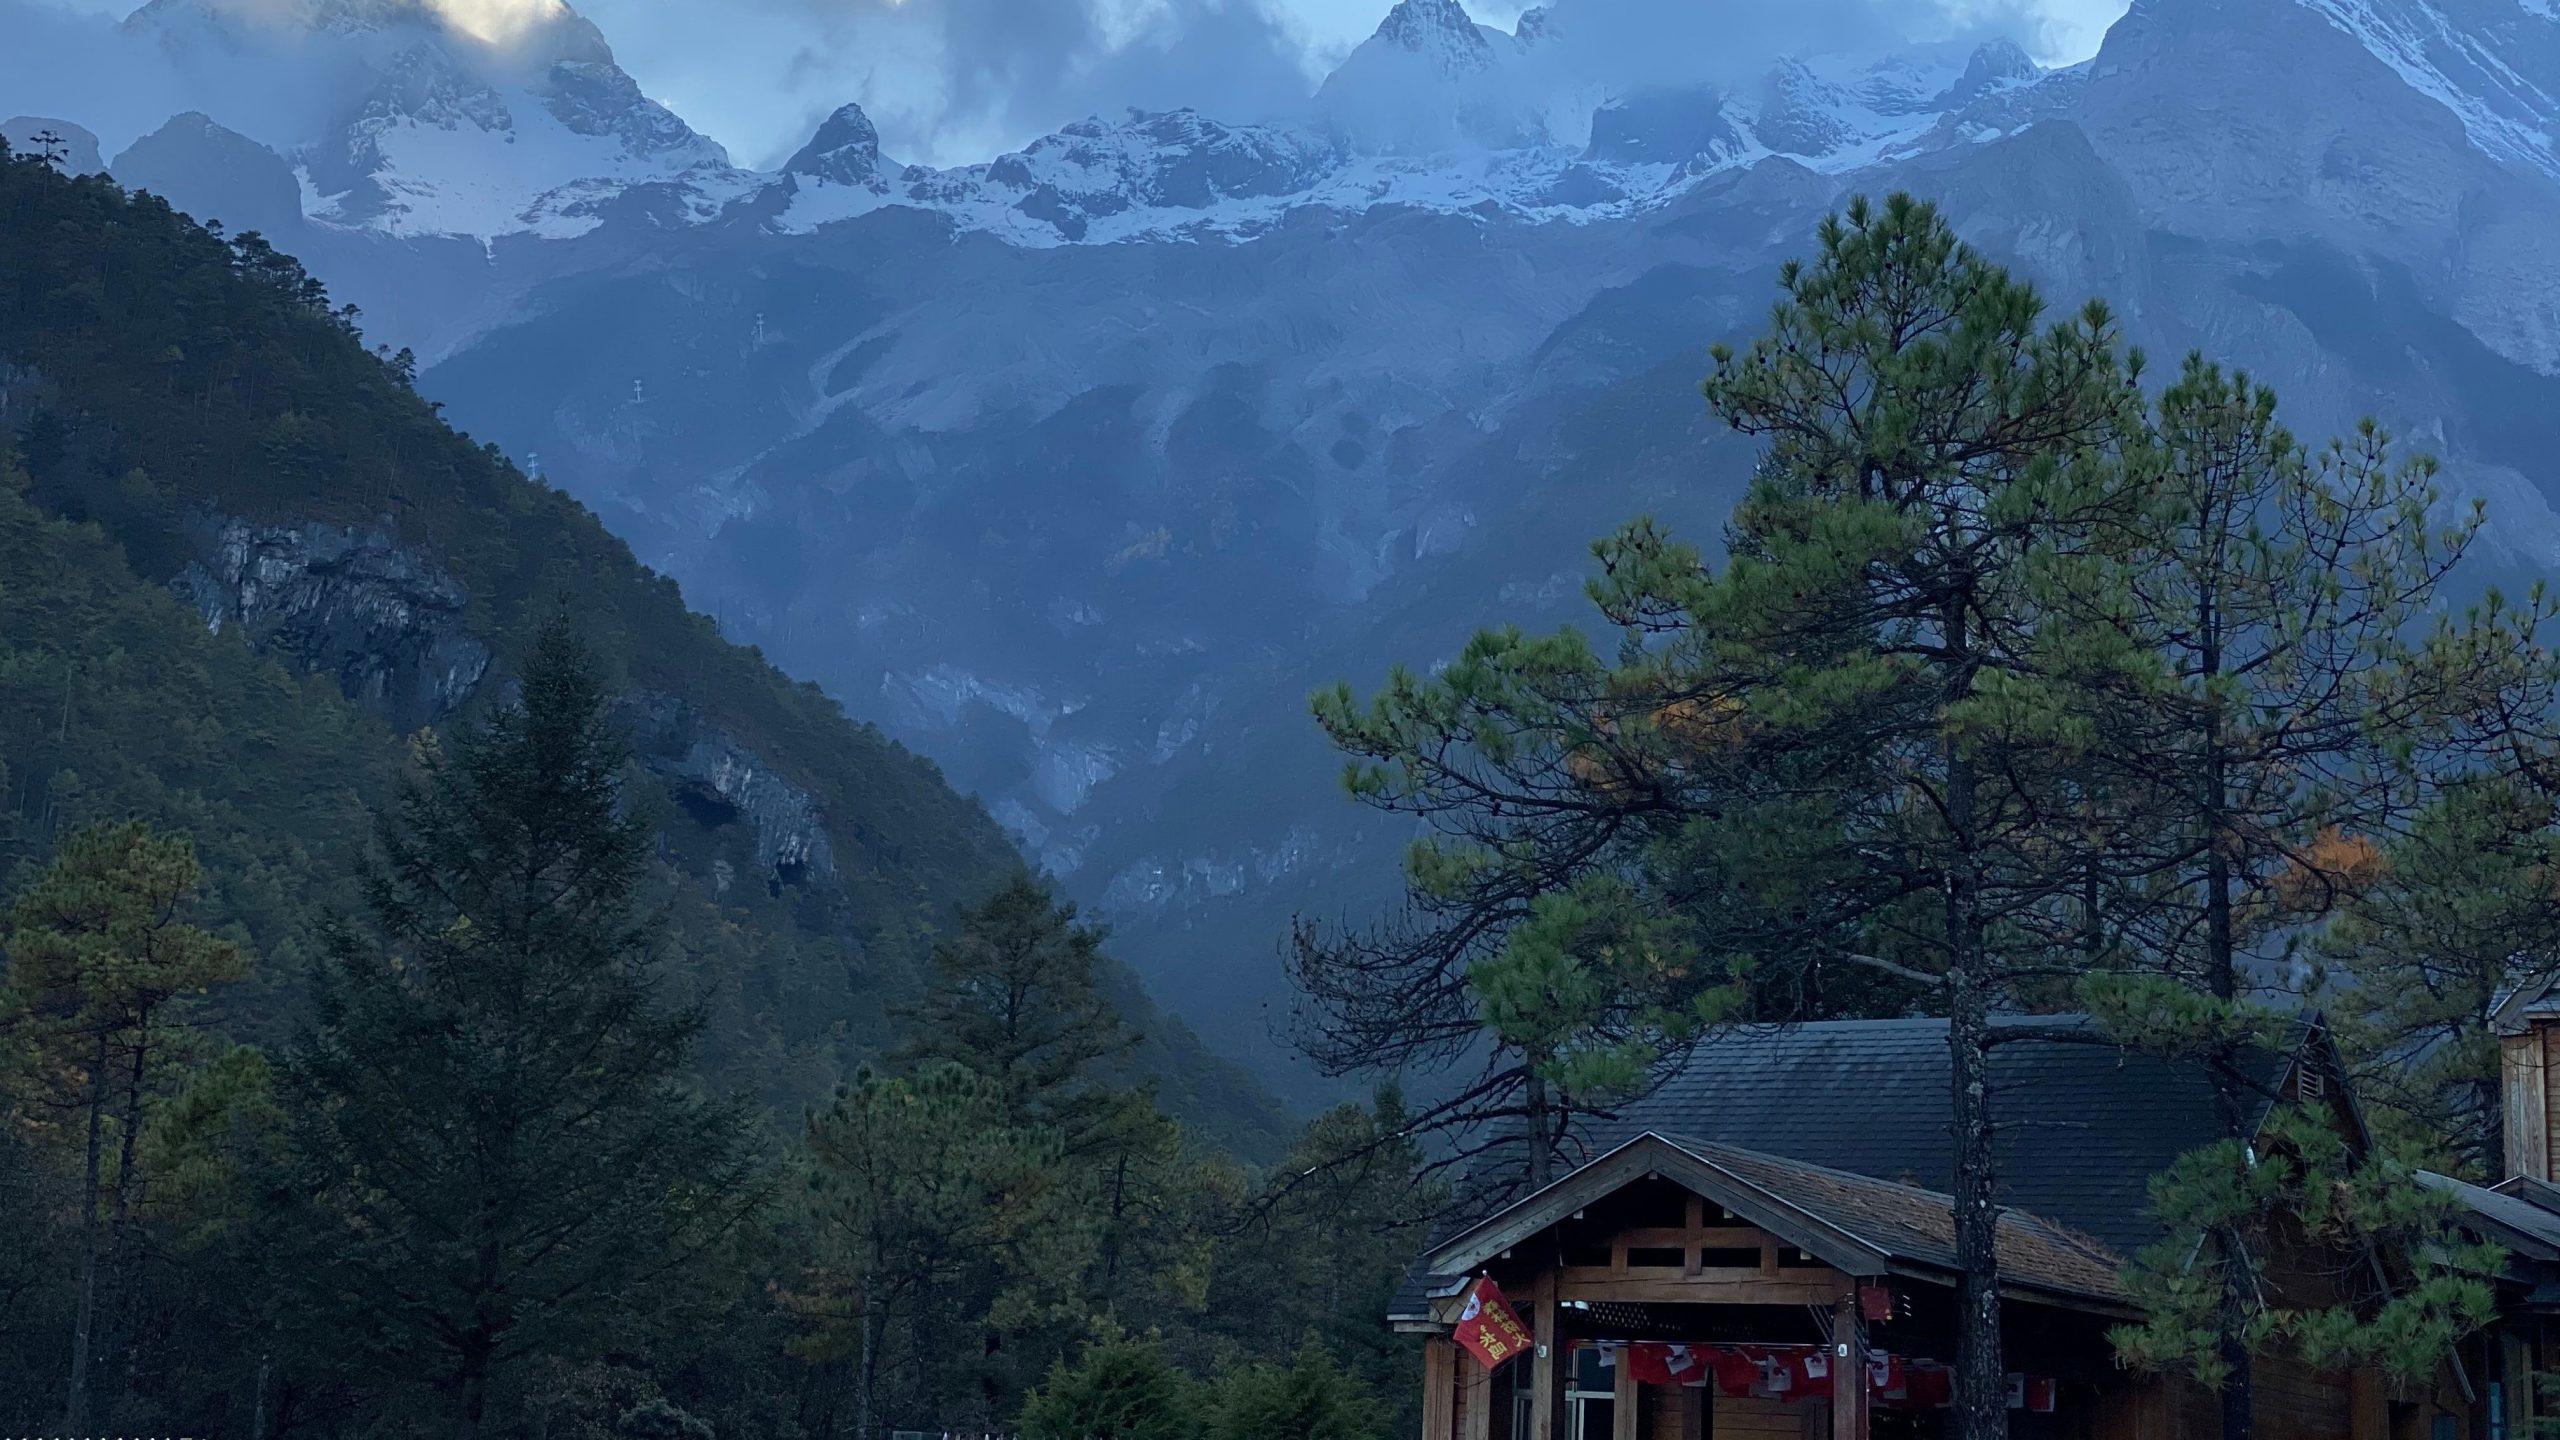 Yulong Snow Mountain N P- Yunnan